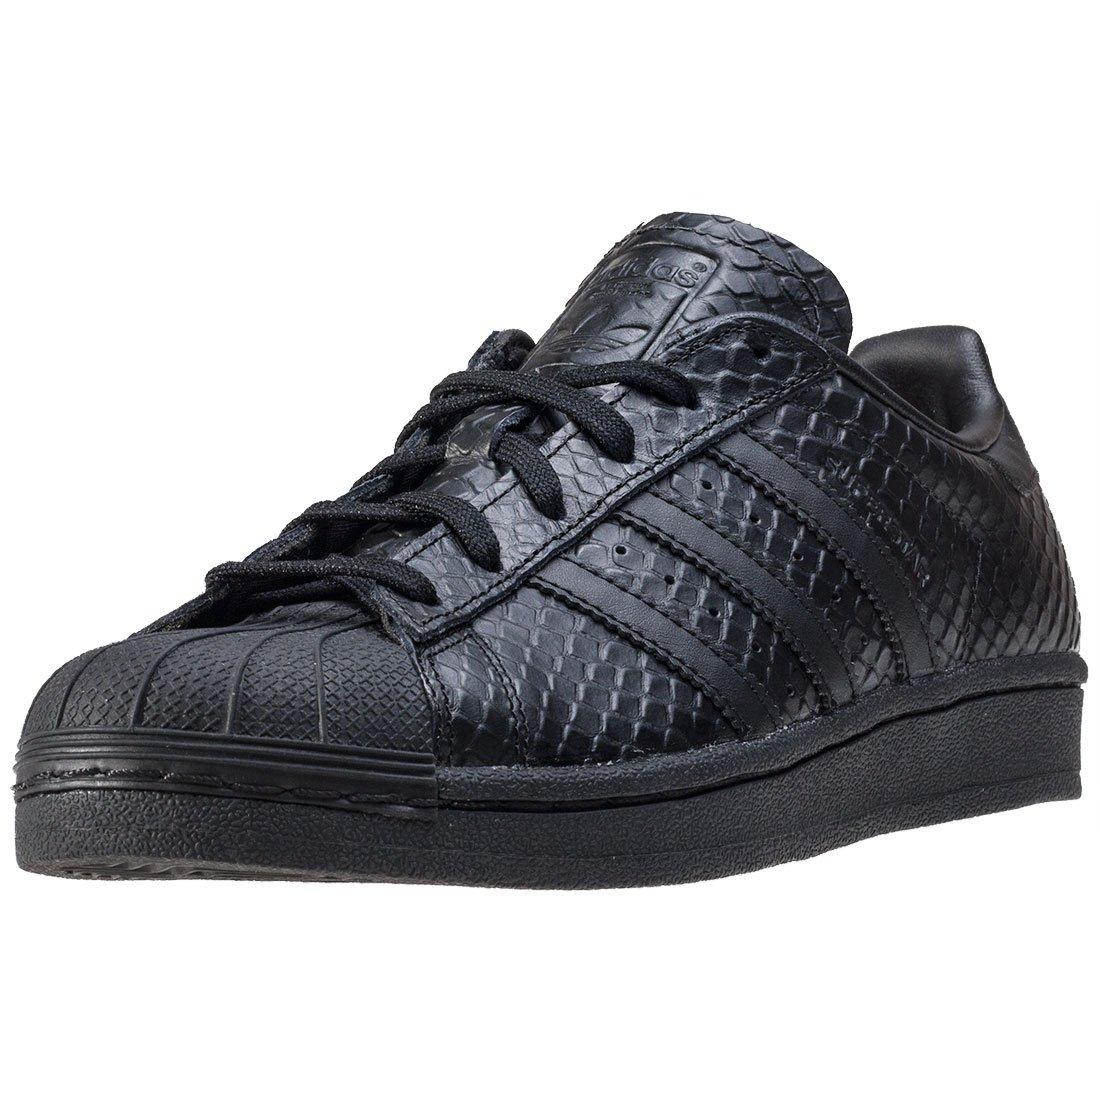 Adidas Superstar S76147 Damen Turnschuhe Schwarz 36